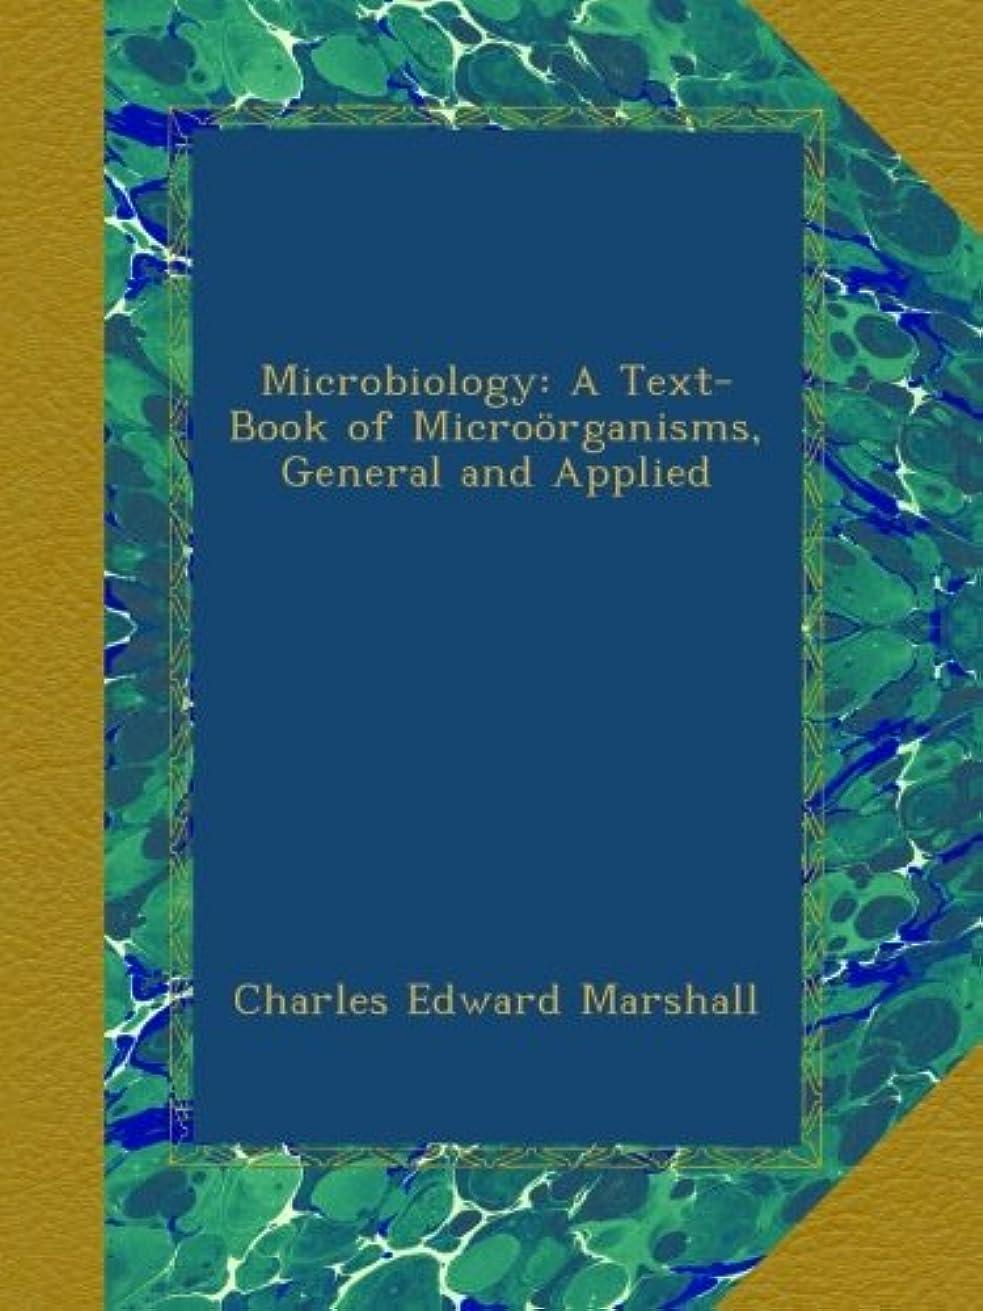 部補体時々時々Microbiology: A Text-Book of Microoerganisms, General and Applied